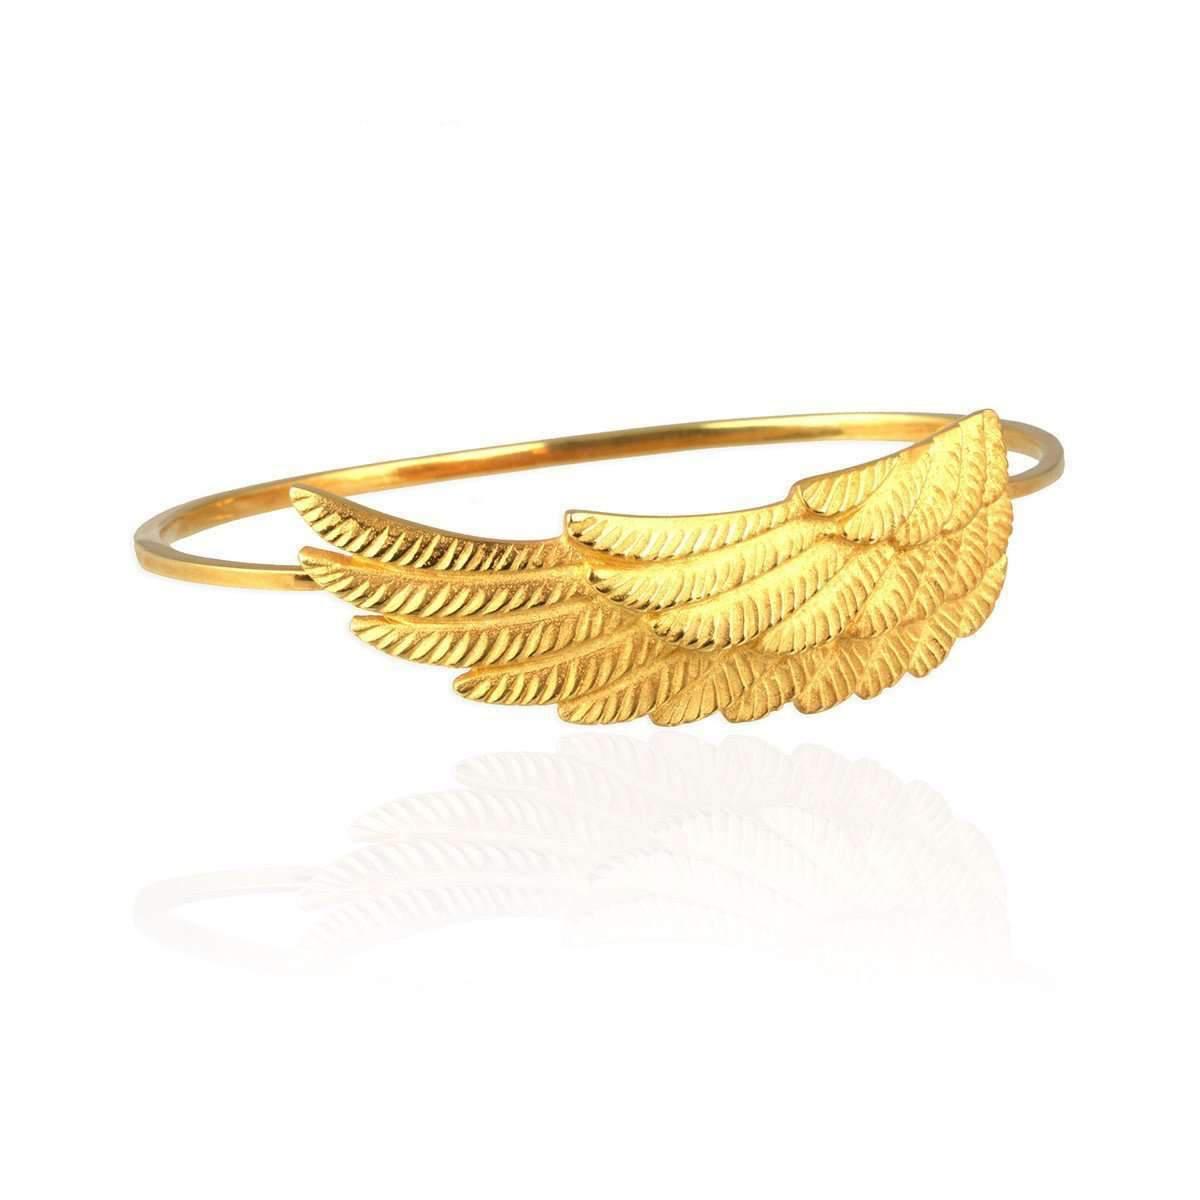 Jana Reinhardt Gold Plated Silver Wing Bangle - 19cm Medium EsI2ik3wY